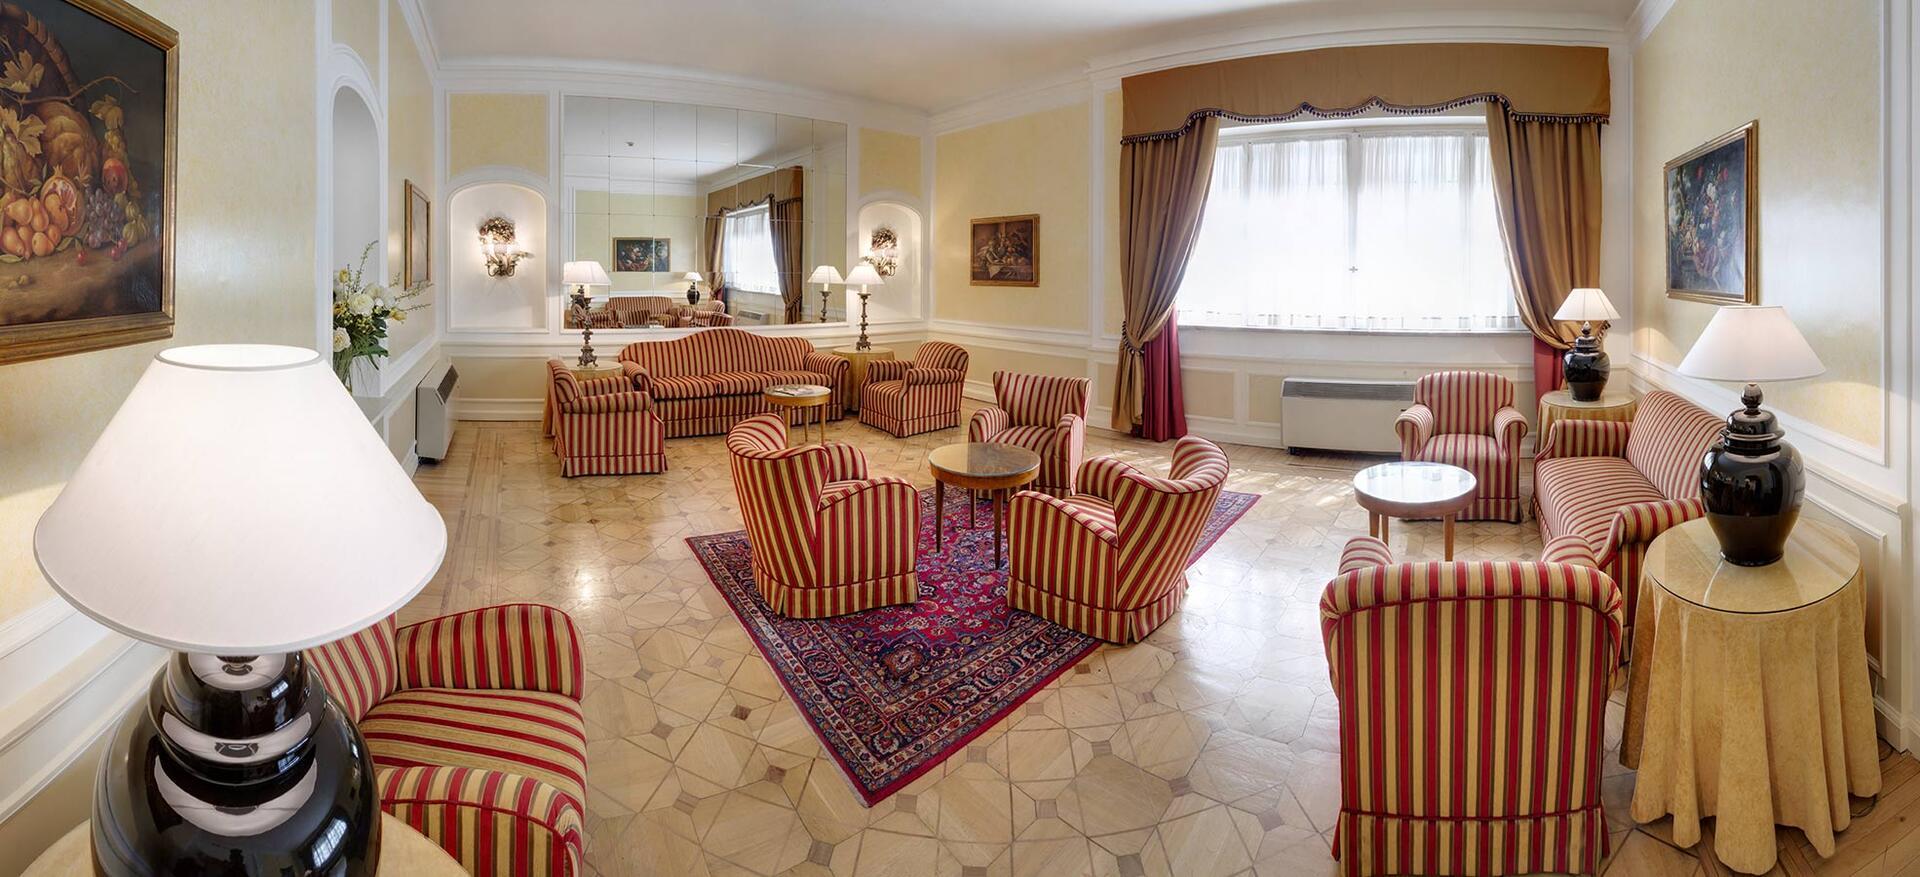 Bettoja Hotel Atlantico Best Hotels In Rome City Centre